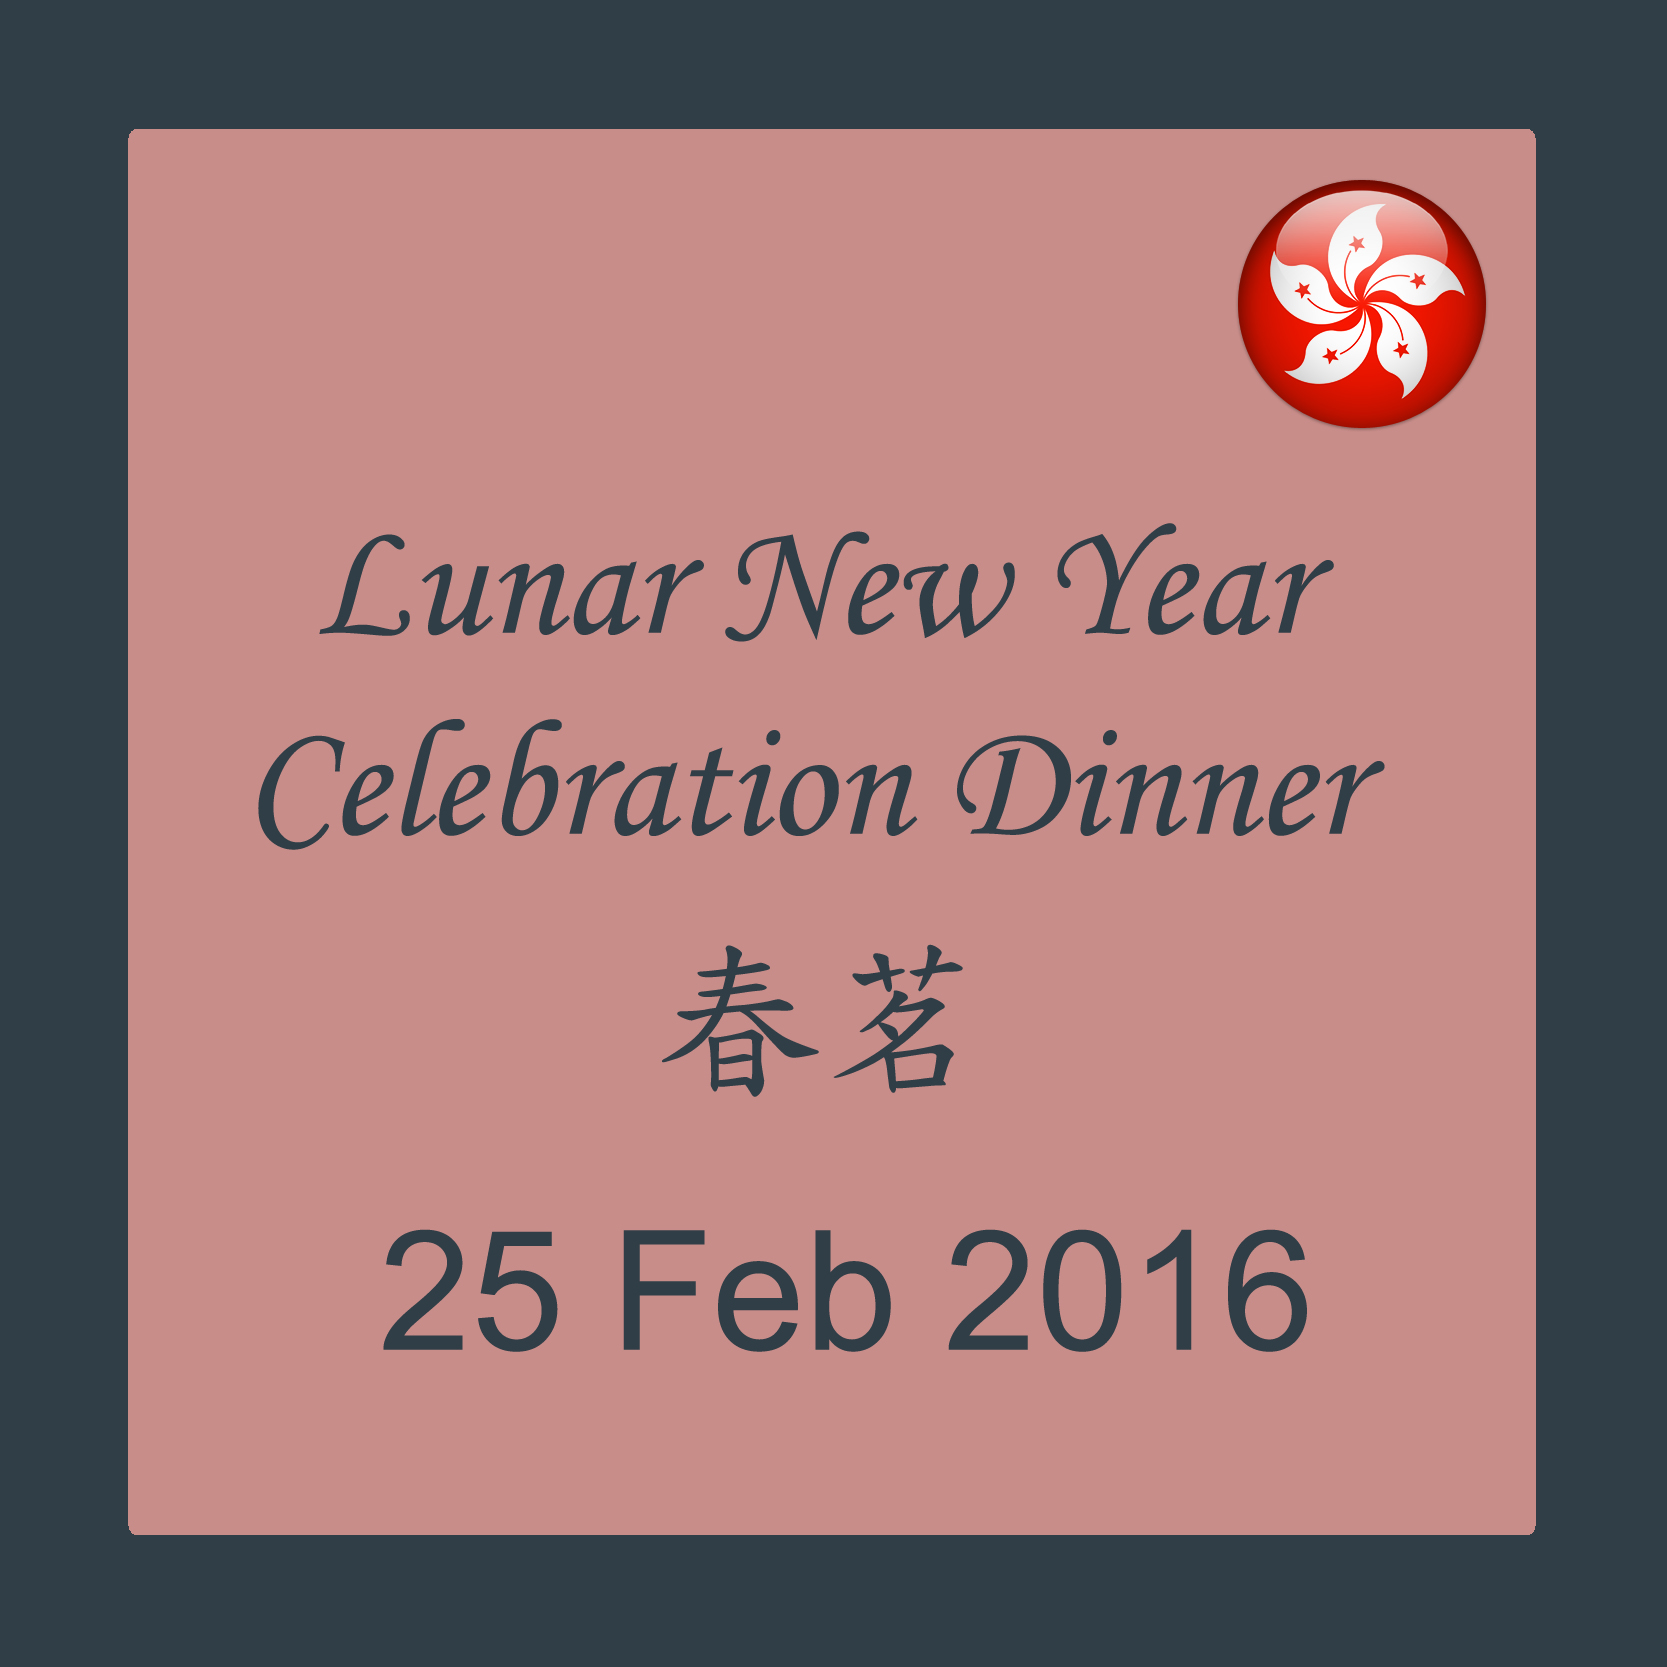 Feb 25 - Lunar New Year Celebration Dinner @ Hong Kong